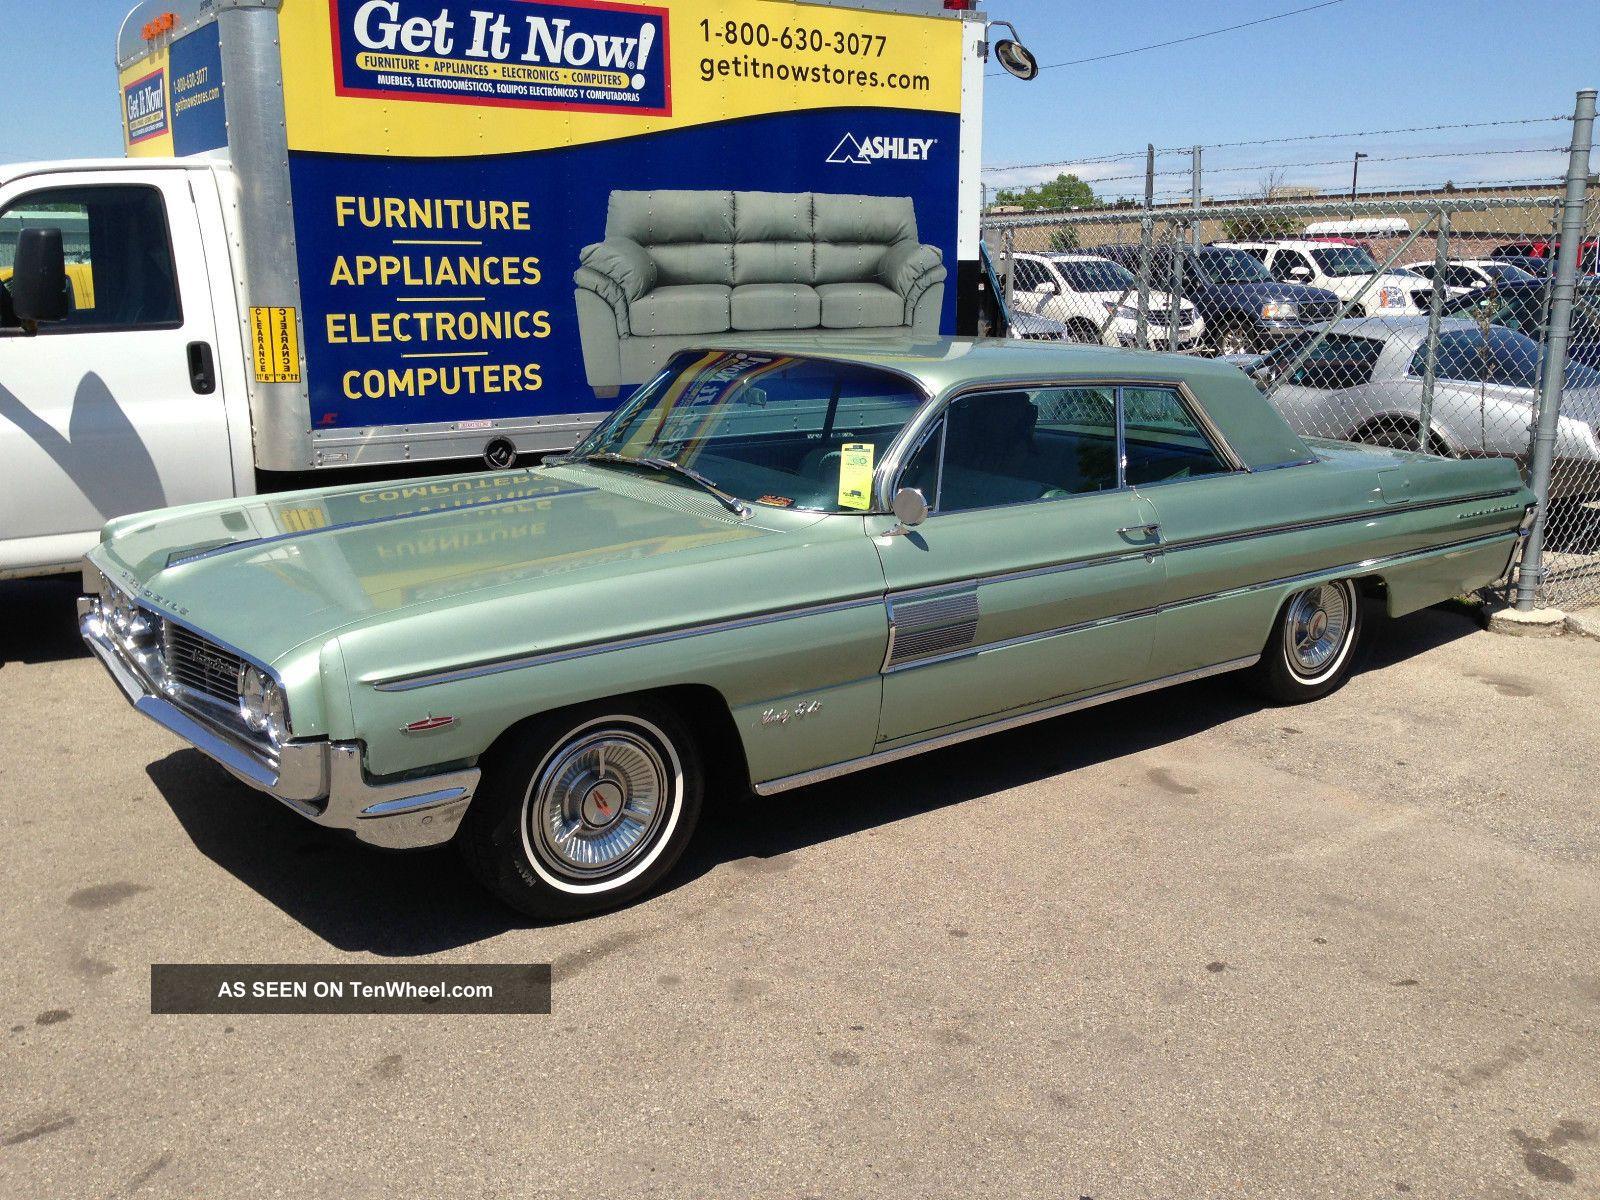 1962 Oldsmobile Ninety - Eight 98 Rare Survivor Ninety-Eight photo